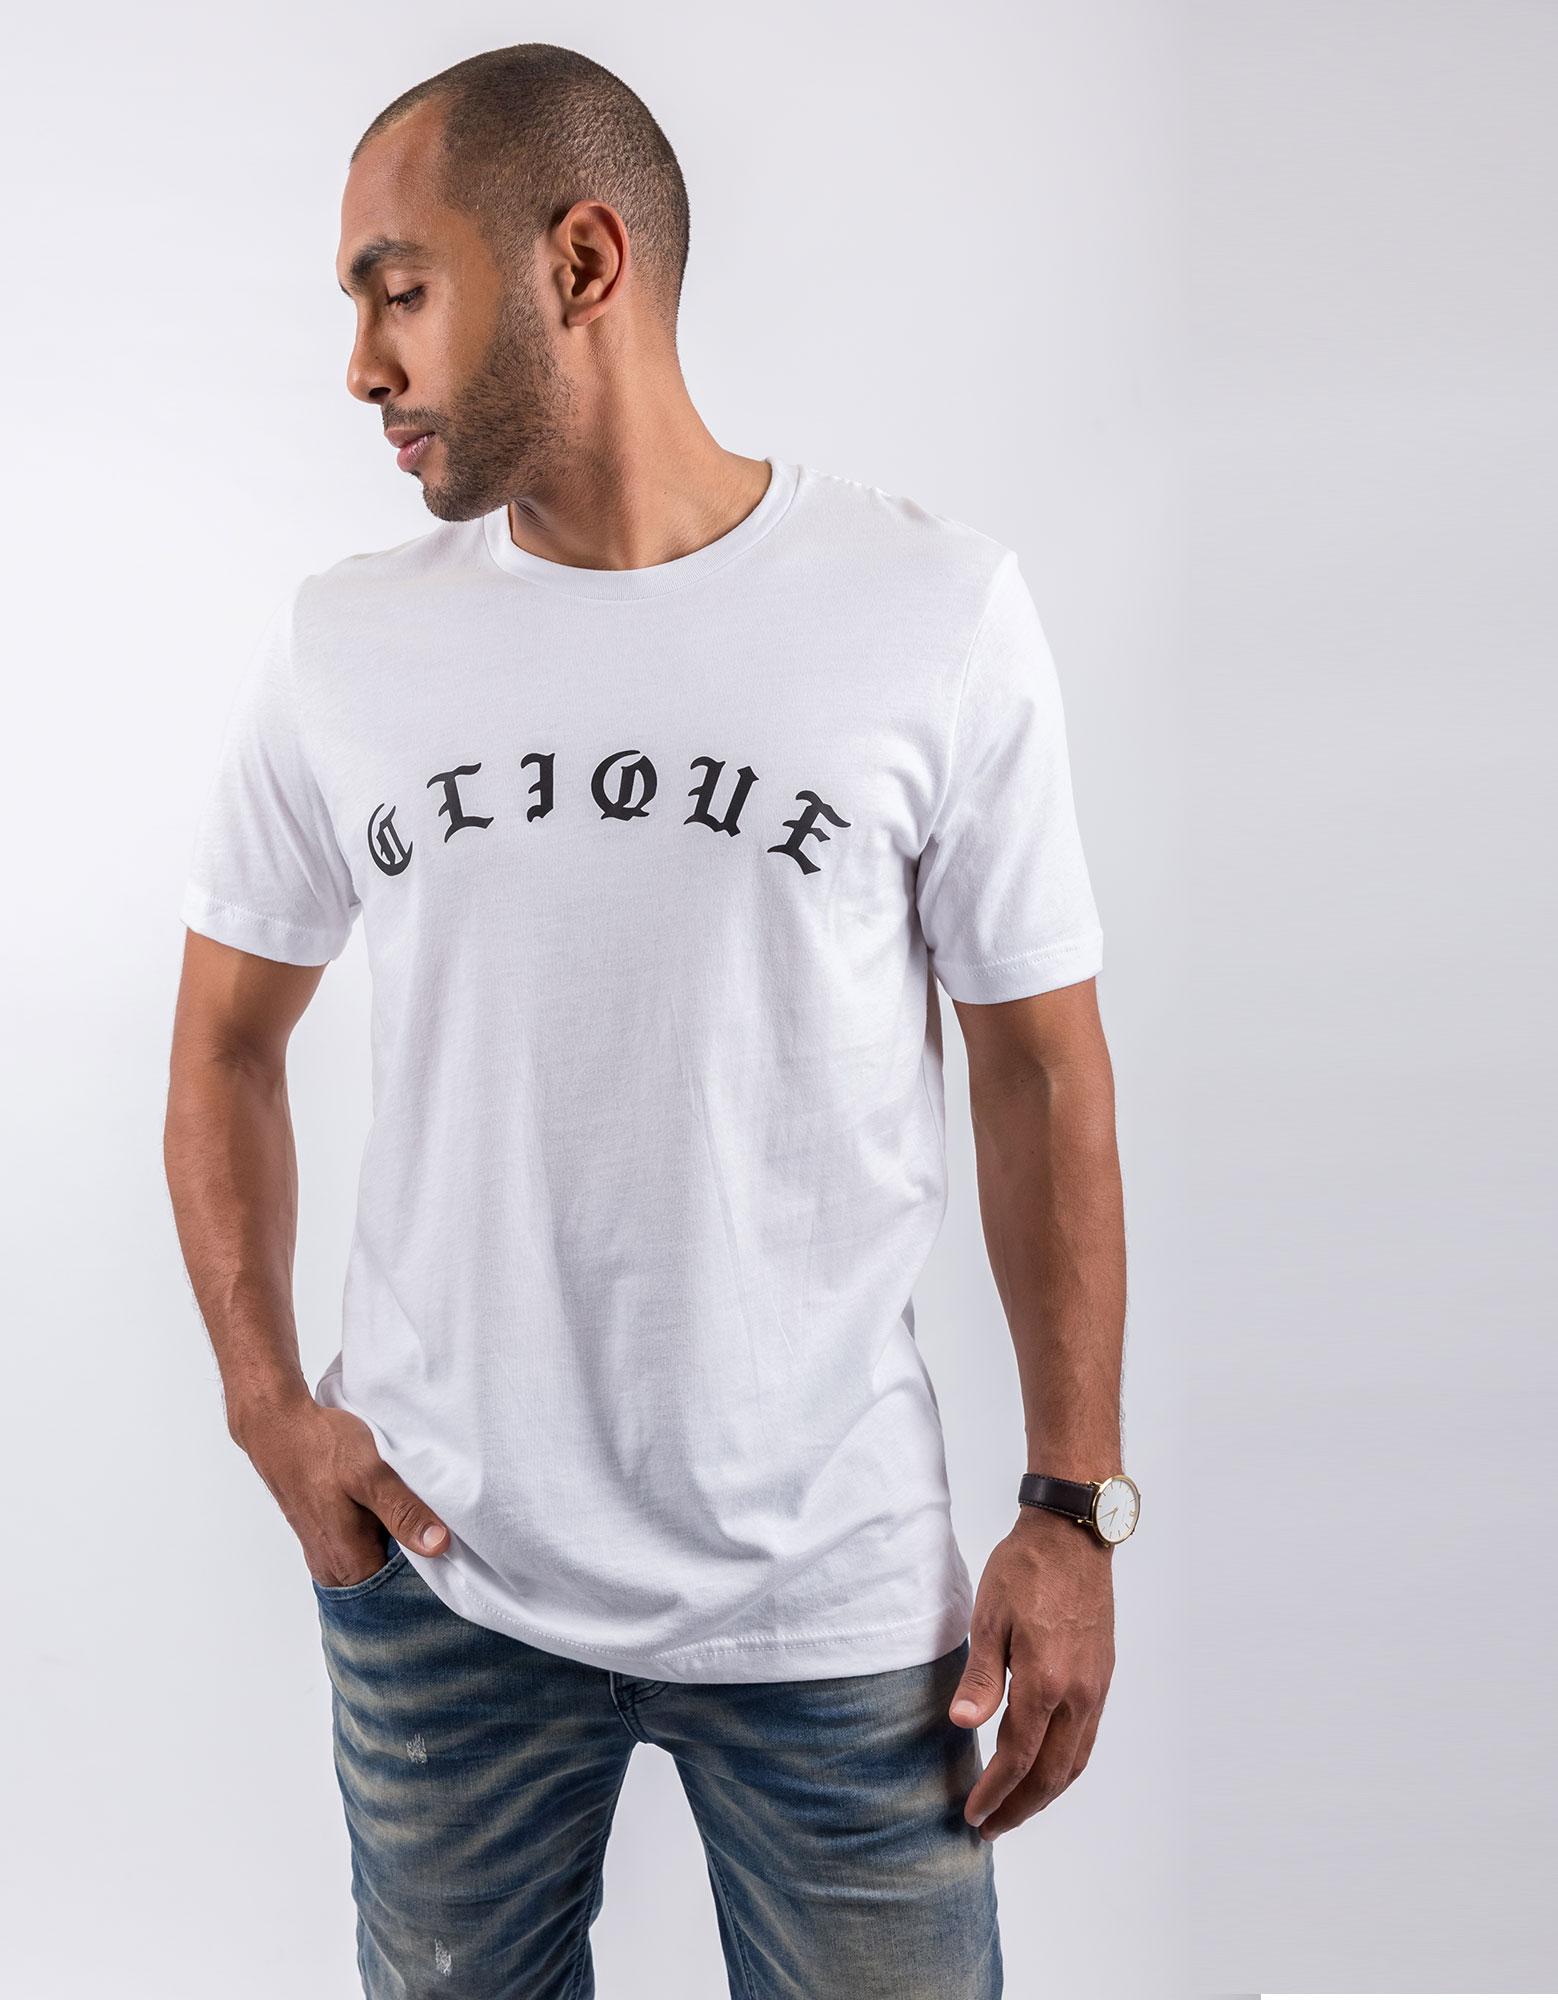 Save The People Clique White Unisex T-Shirt Xl